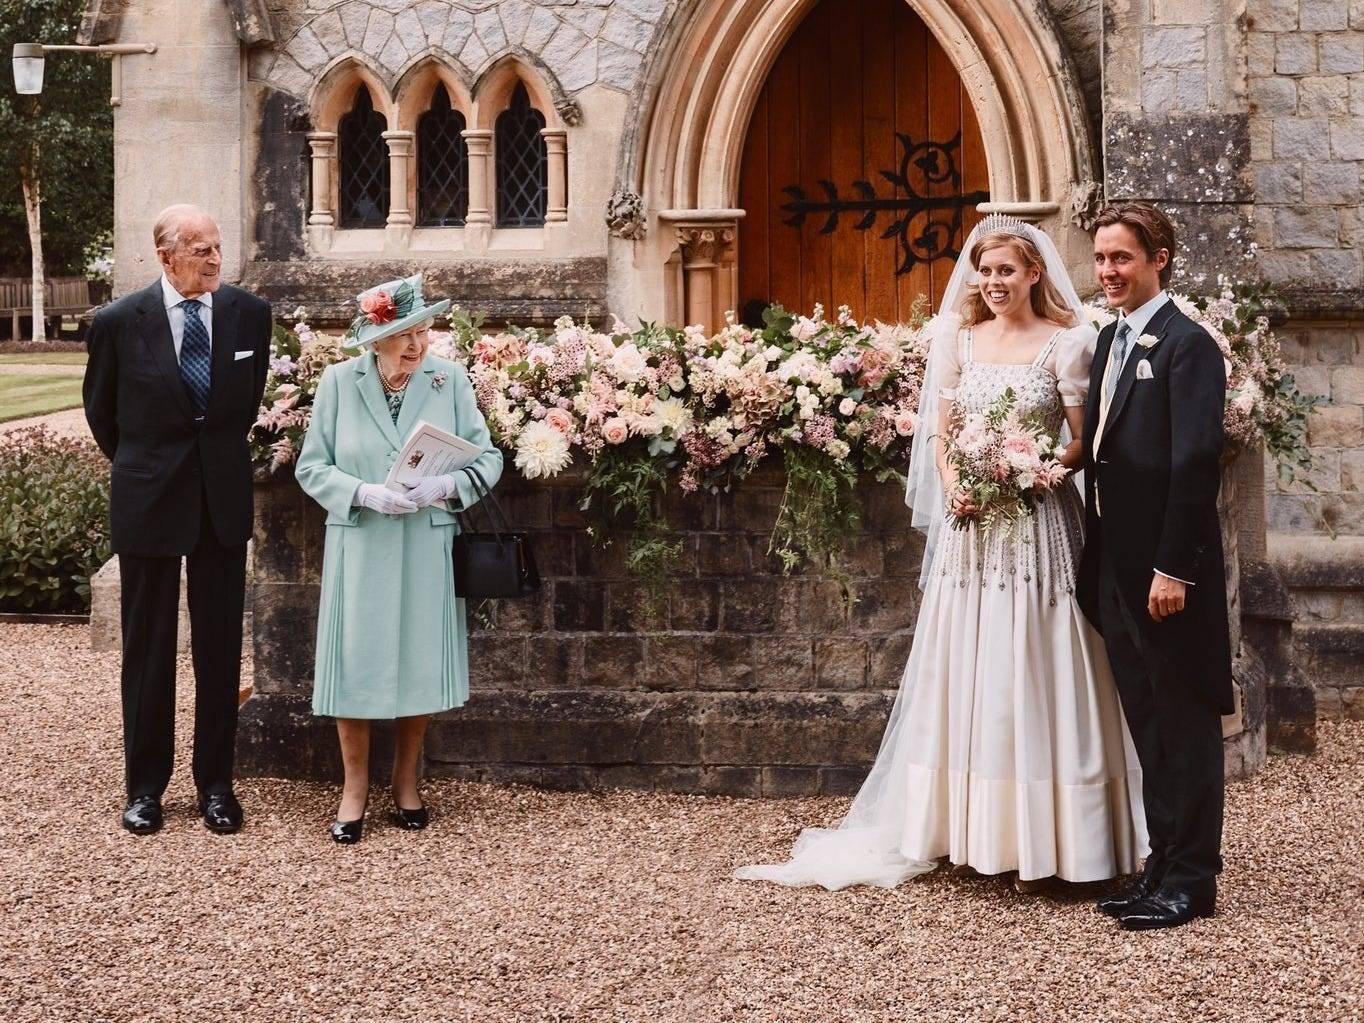 Princess Beatrice Wedding Details You Missed From Secret Ceremony Insider